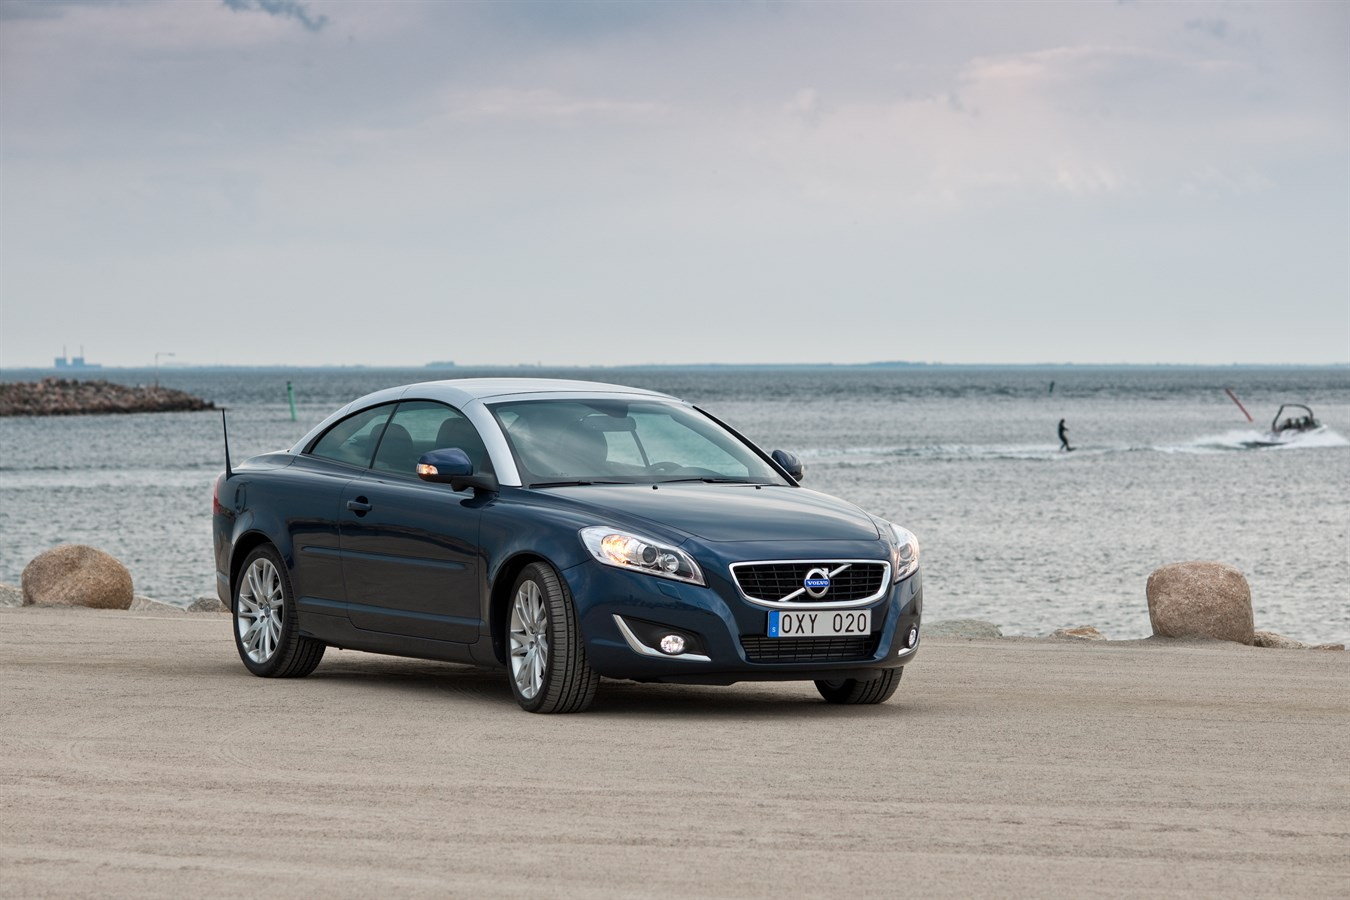 Volvo C70 Model Year 2012 Volvo Car Austria Pressezentrum